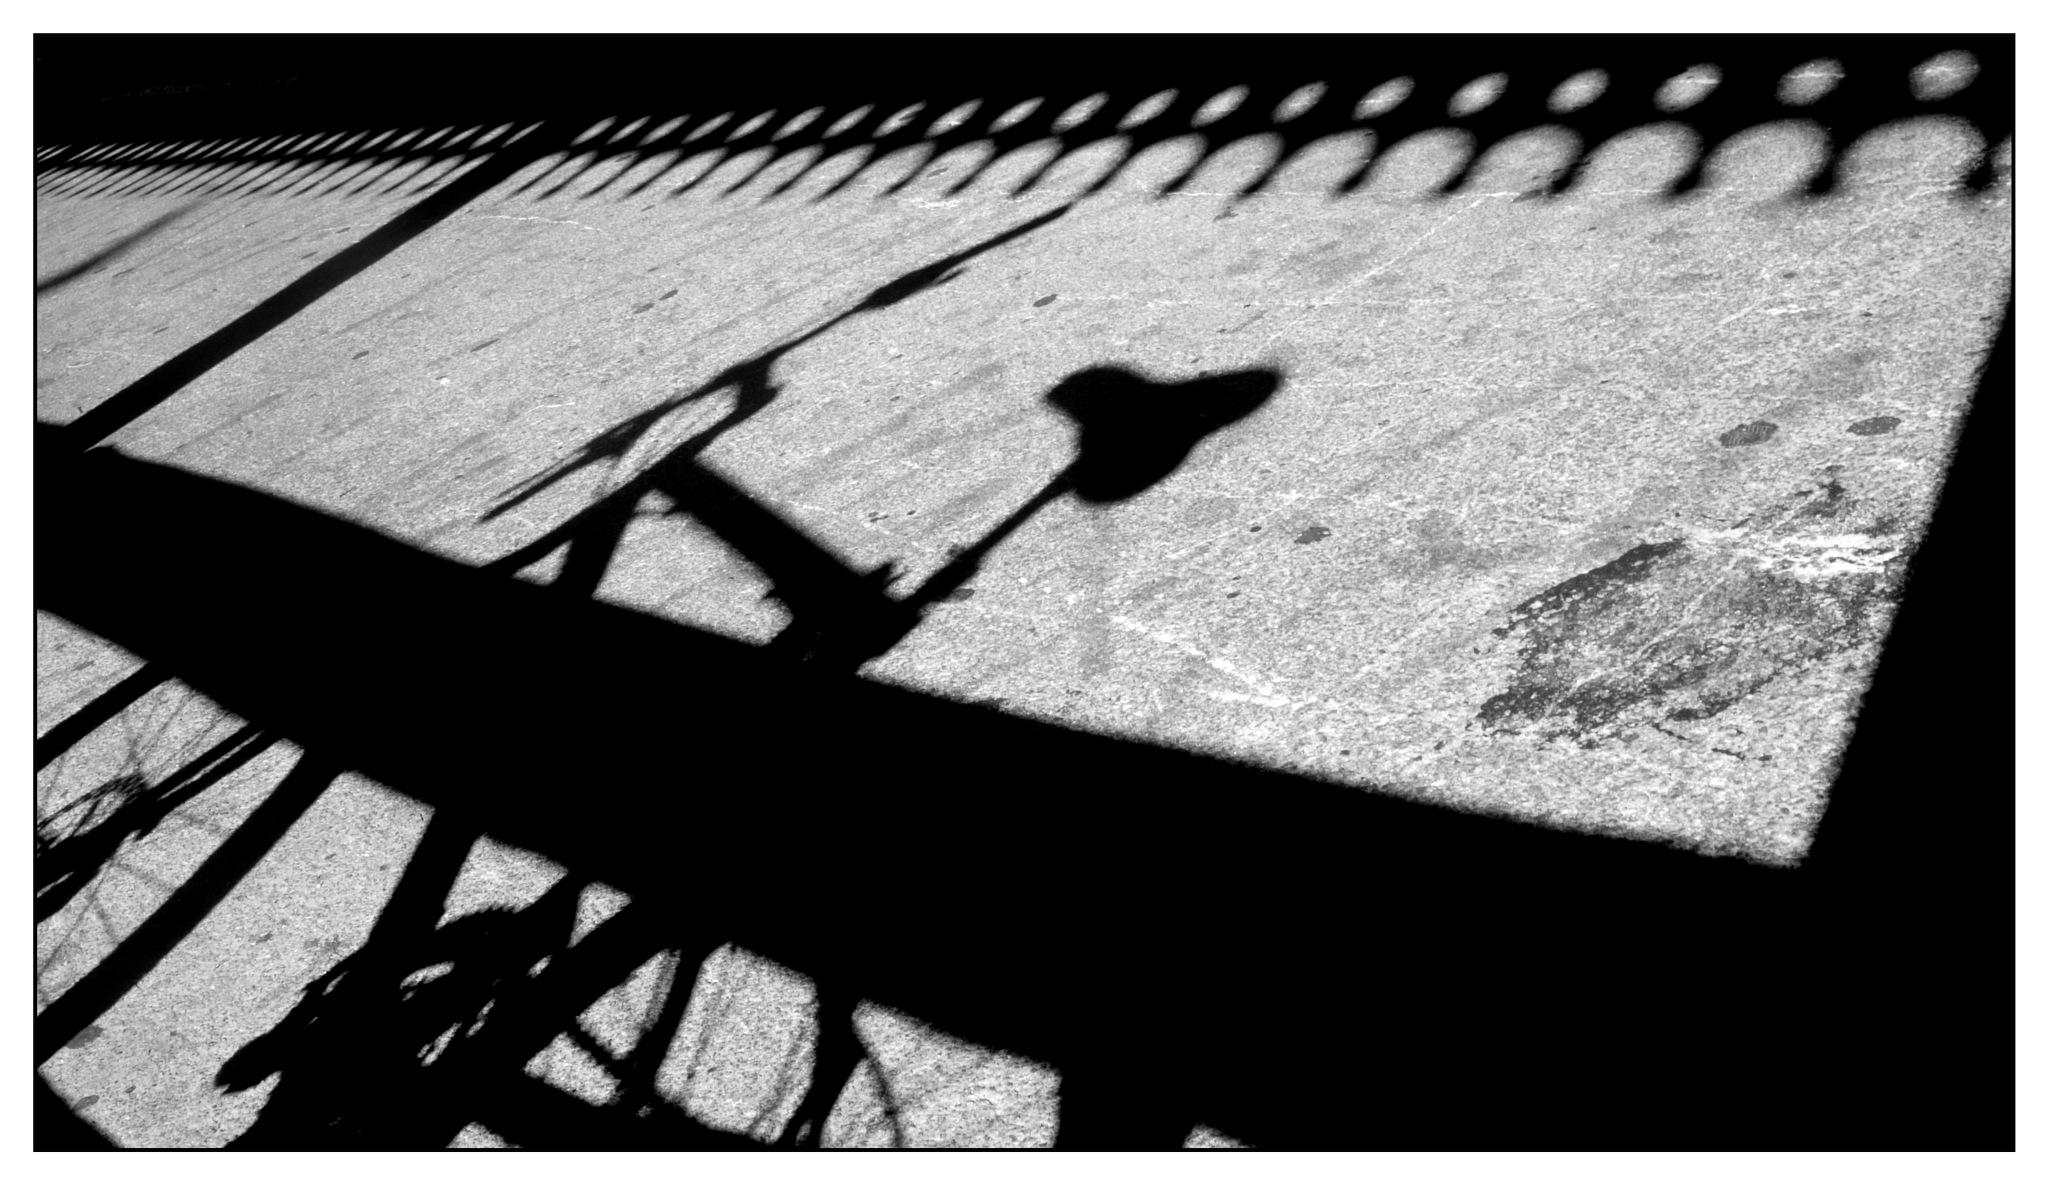 My bike by José Evaldo Suassuna de Oliveira